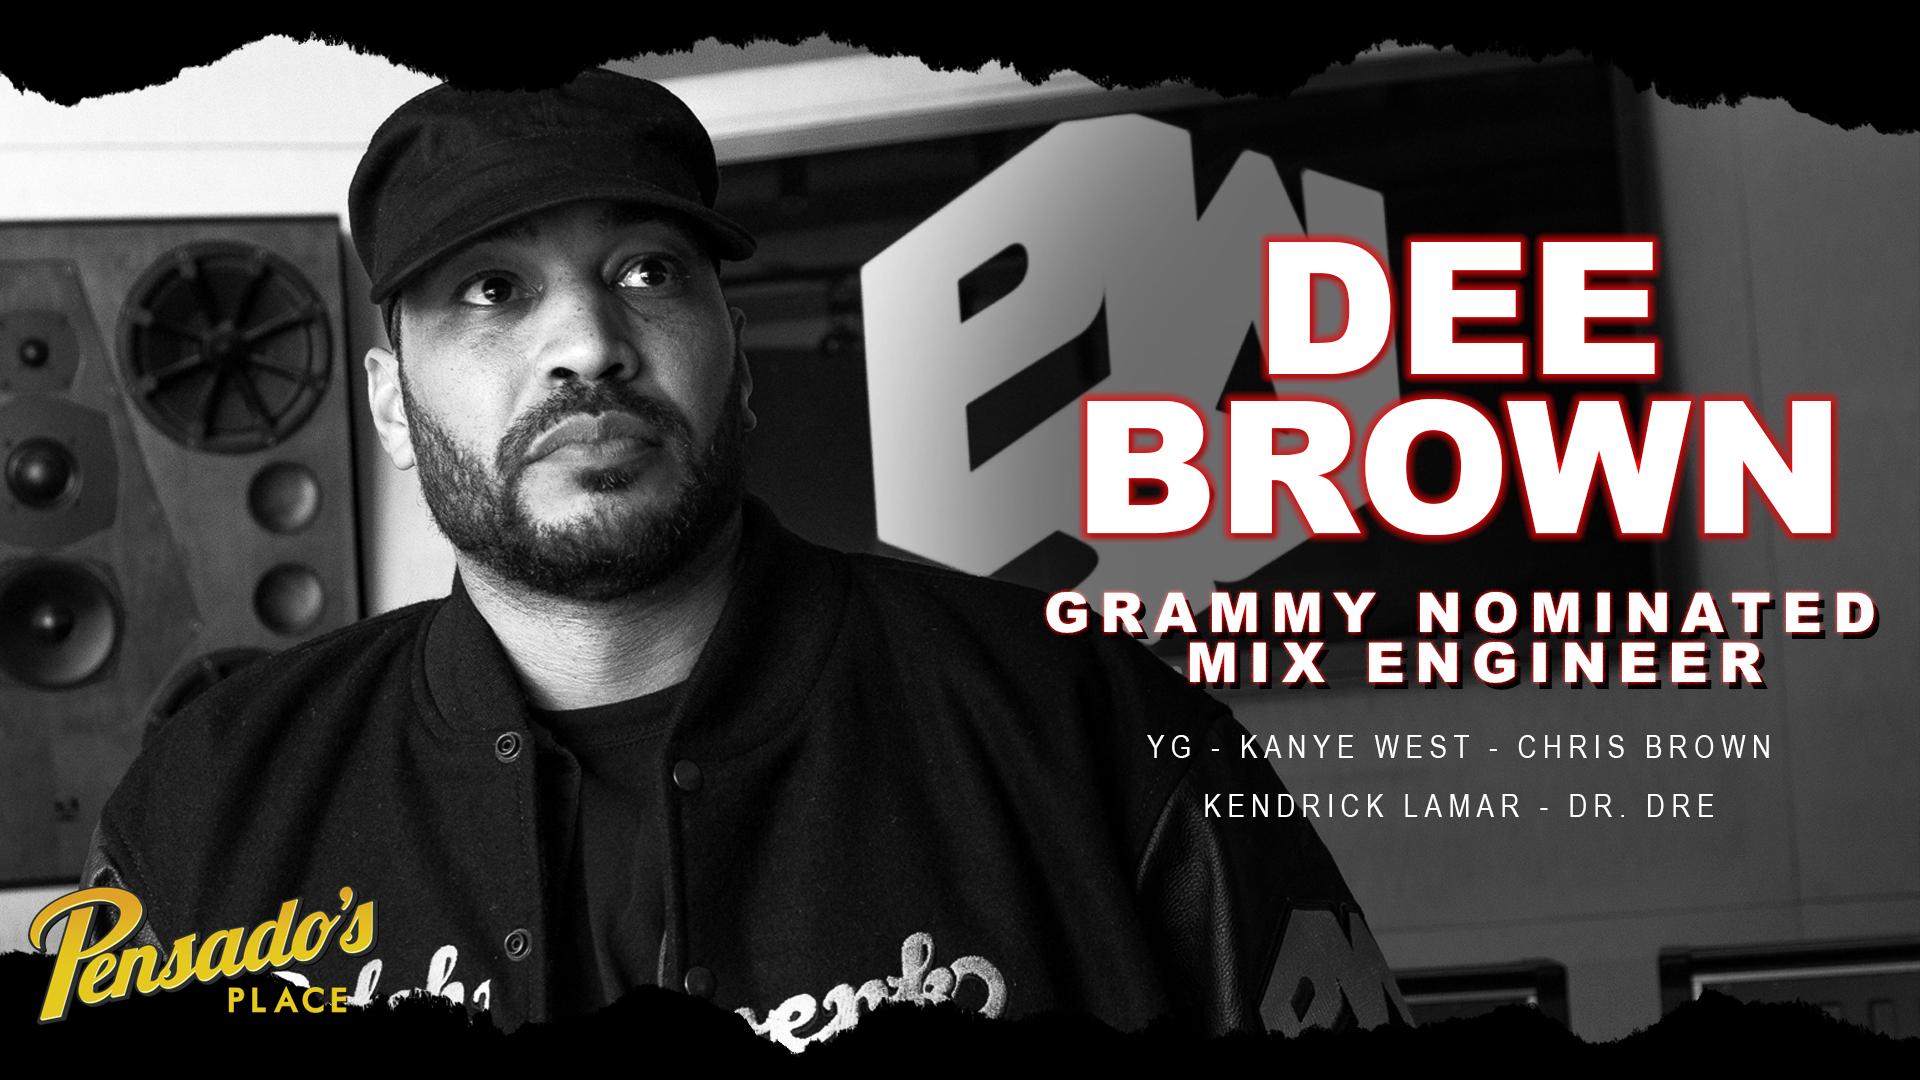 Grammy Nominated Mix Engineer, Dee Brown